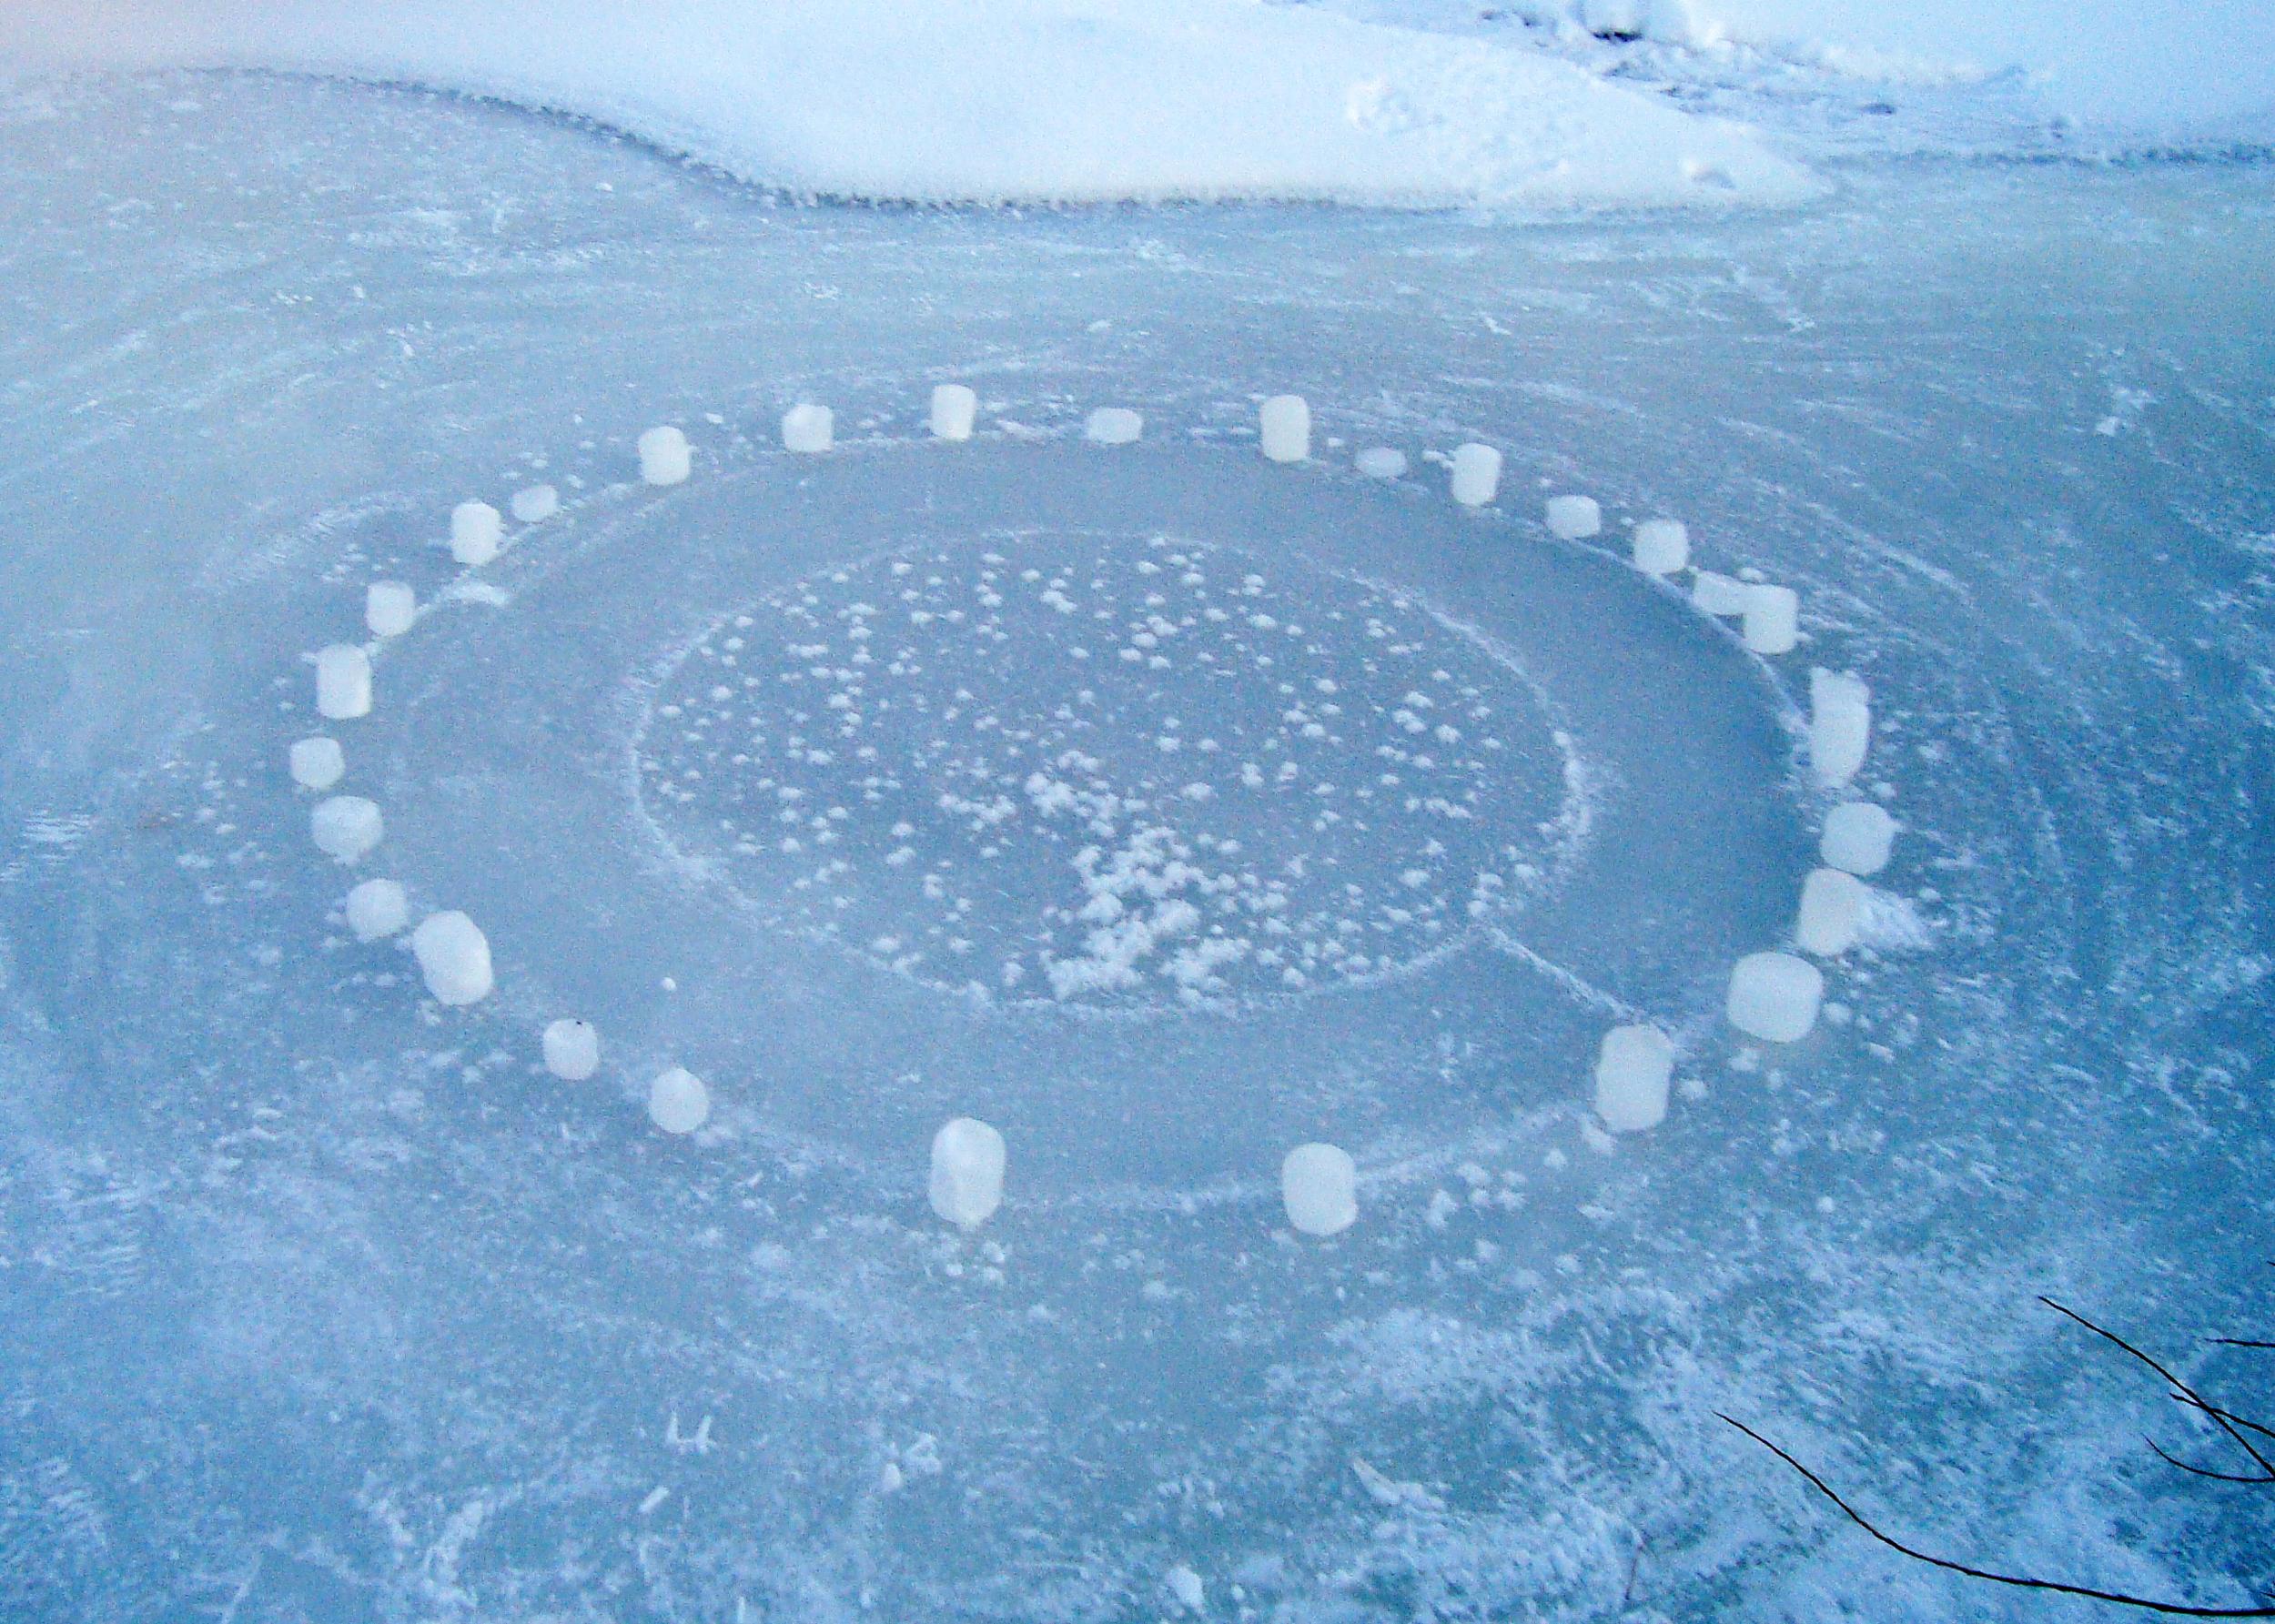 Frozen Creek Mandala 1 of 5 (Day)